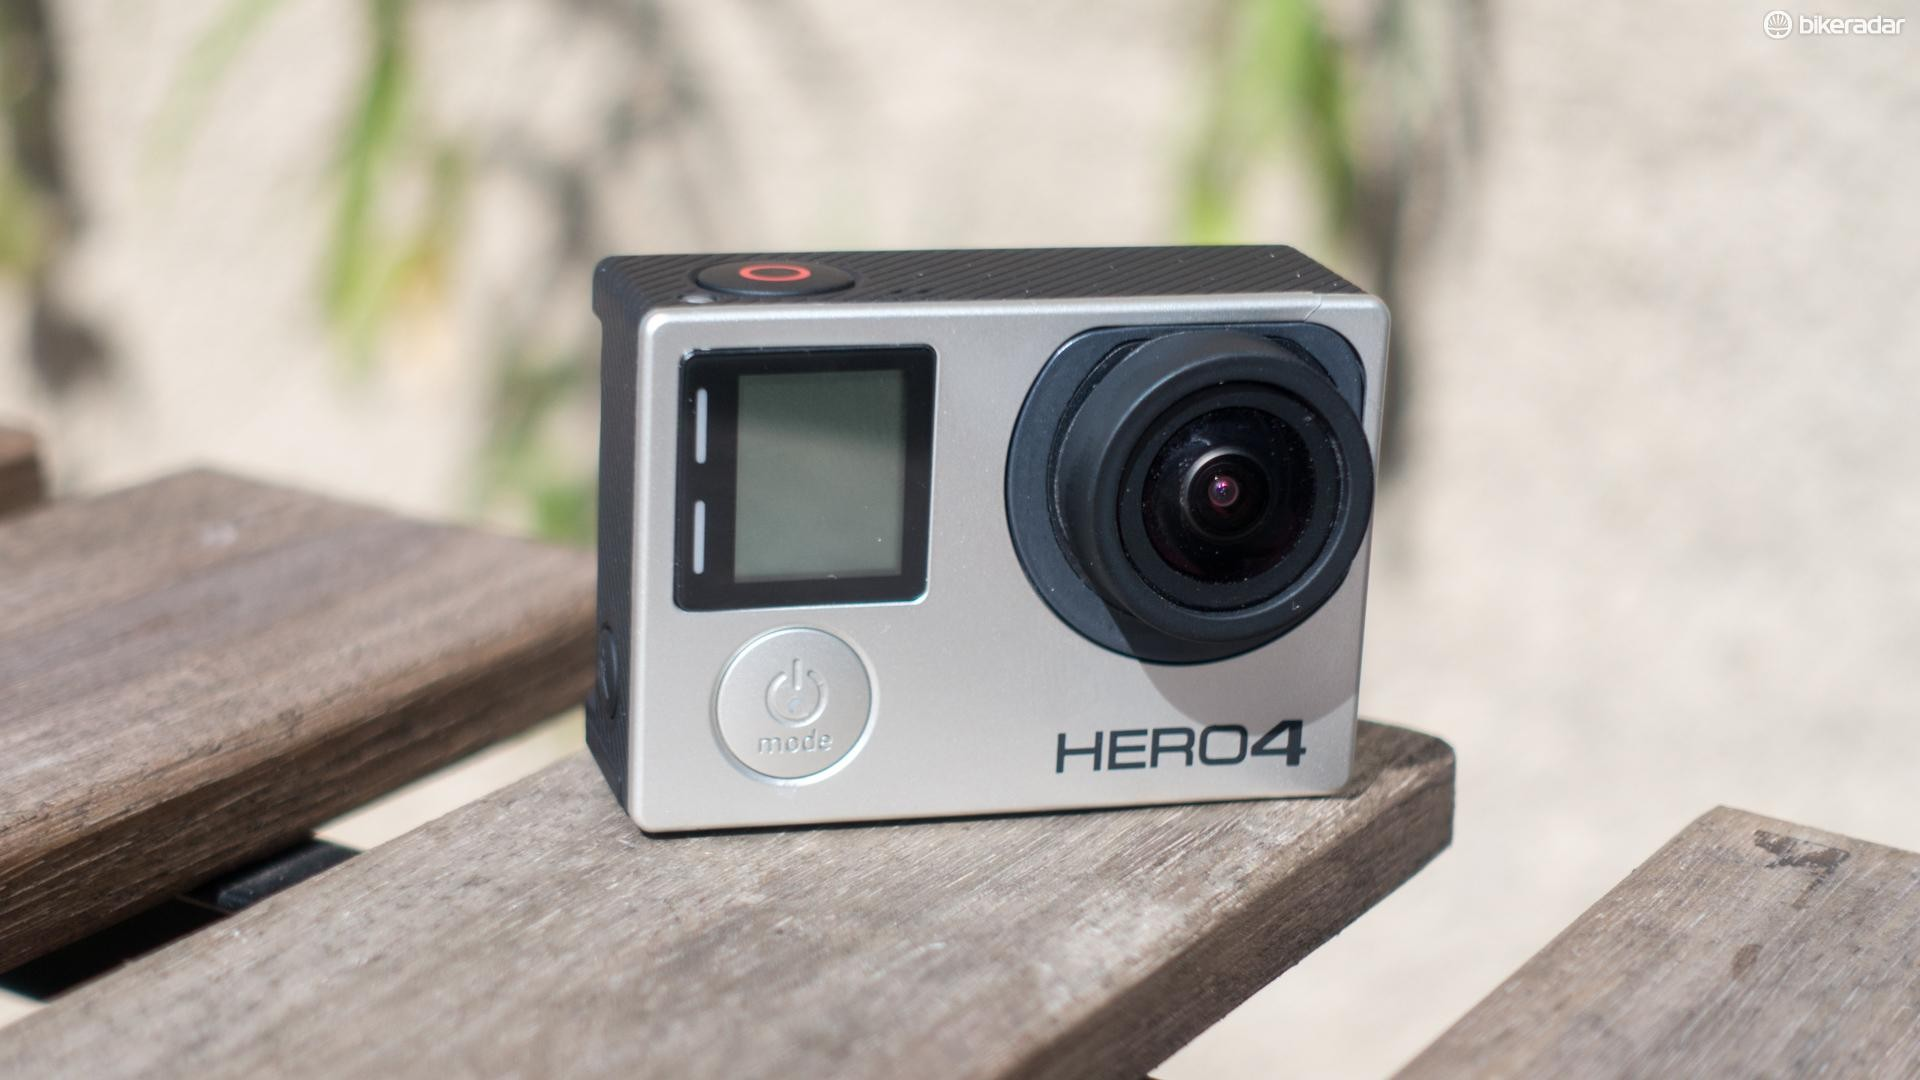 GoPro's Hero 4 Black delivers prosumer-level footage